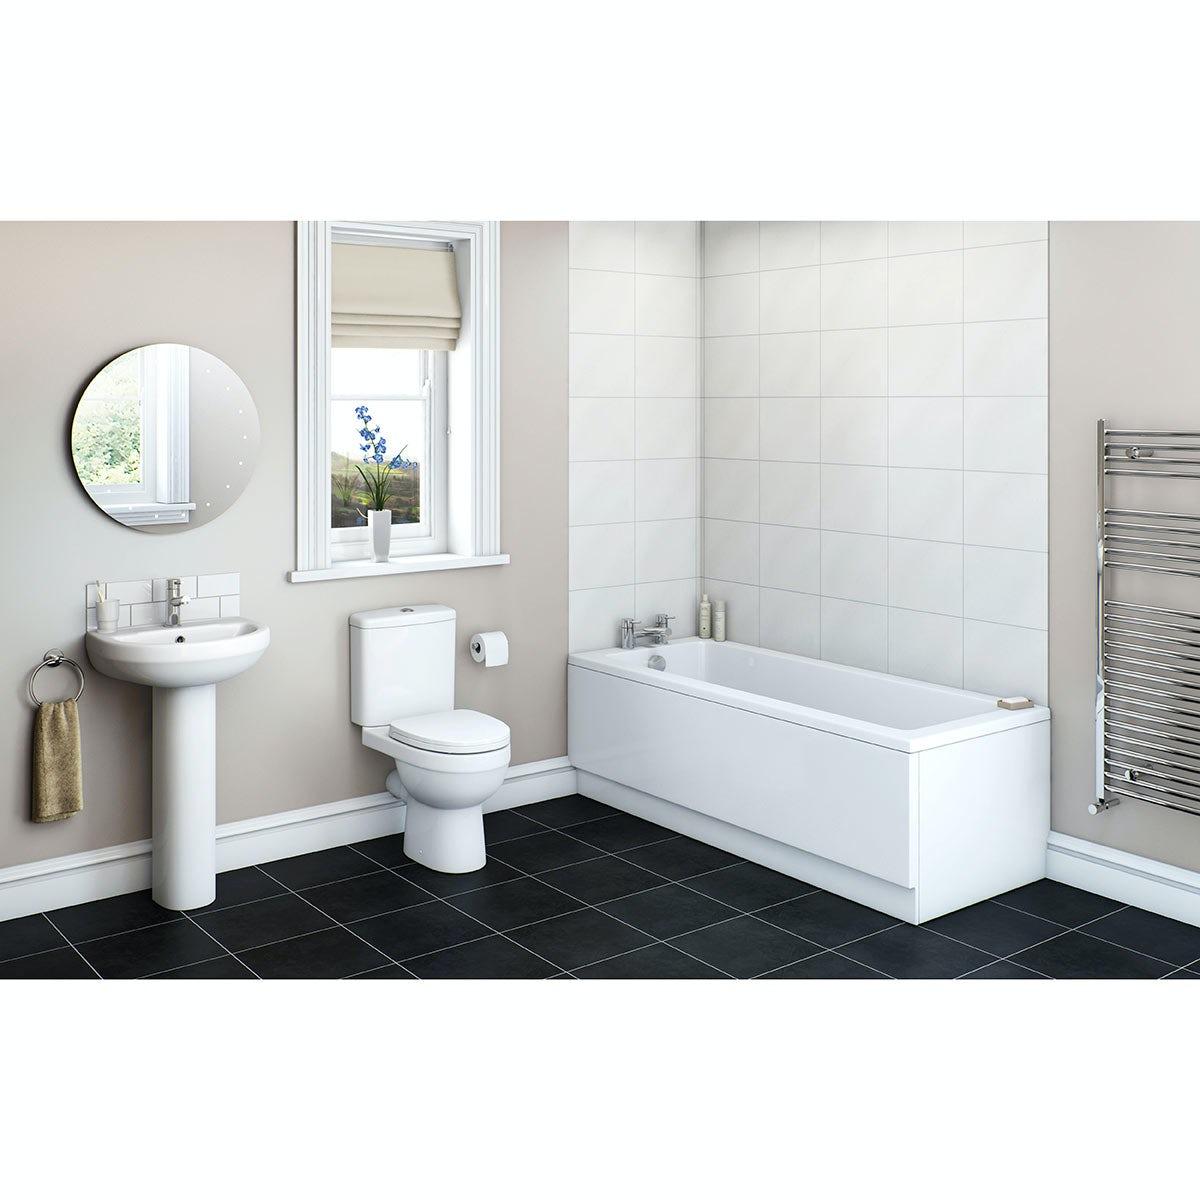 Orchard Eden Bathroom Suite With Straight Bath 1700 X 700